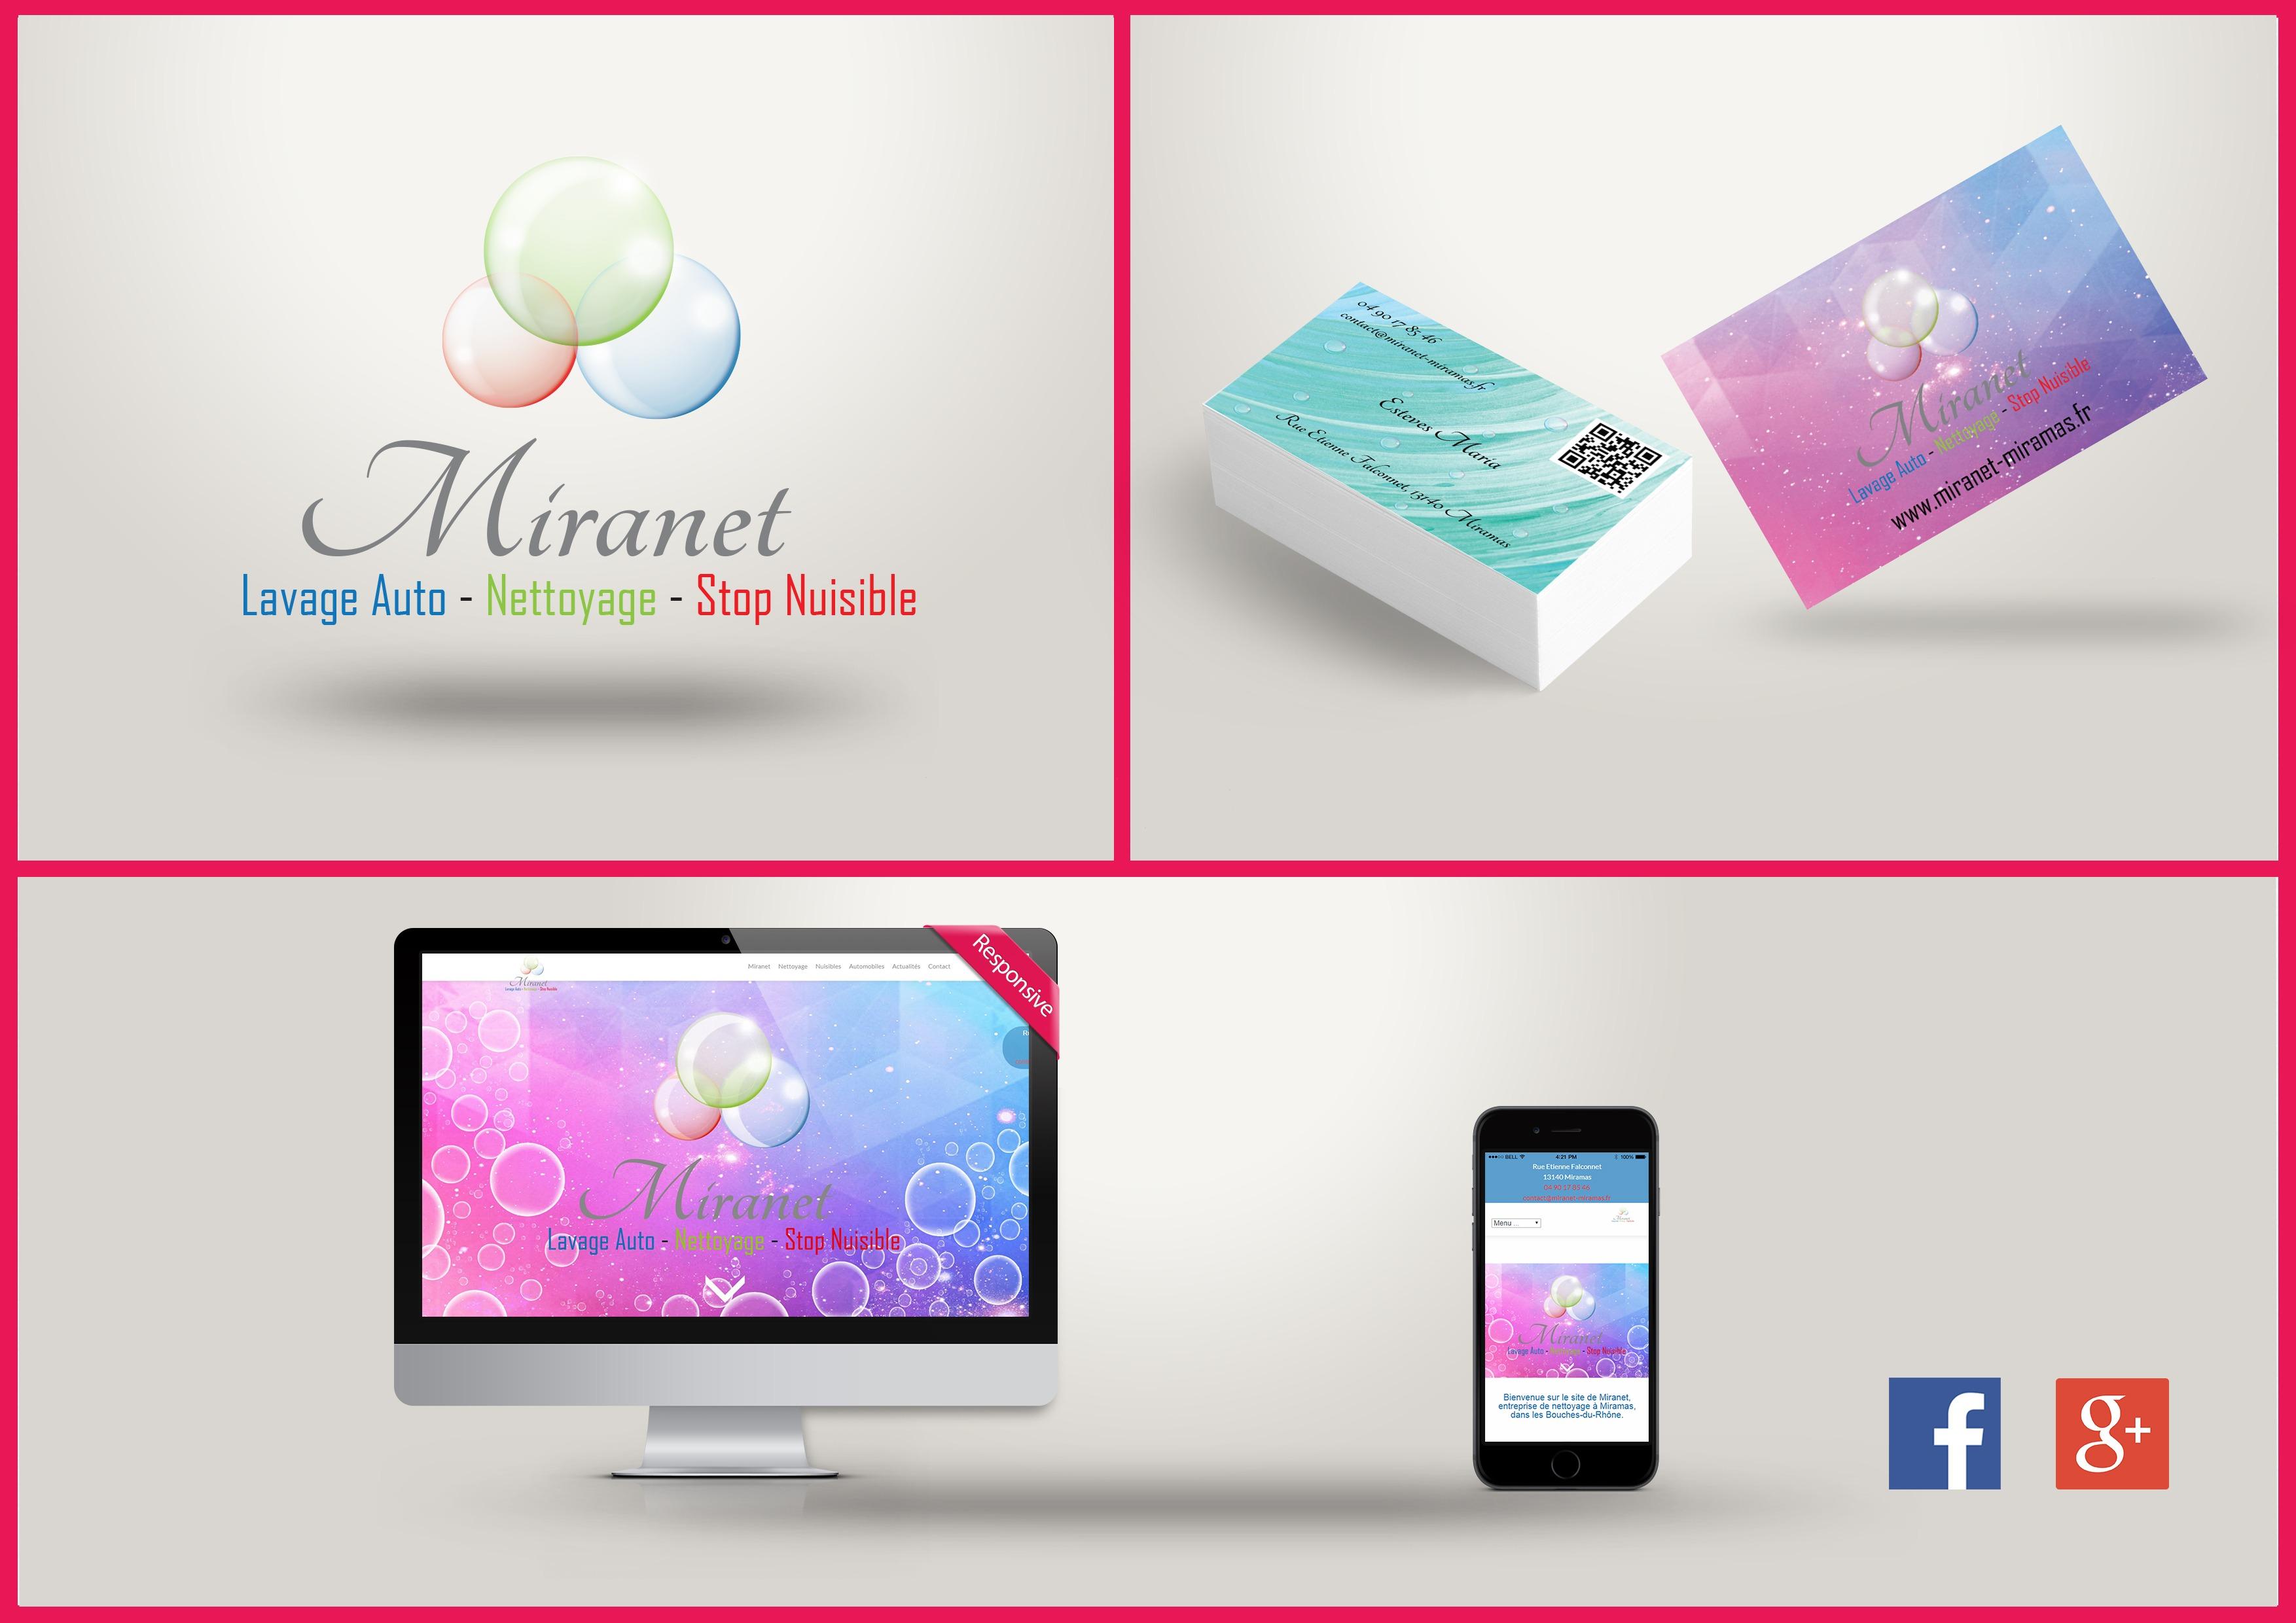 Miranet